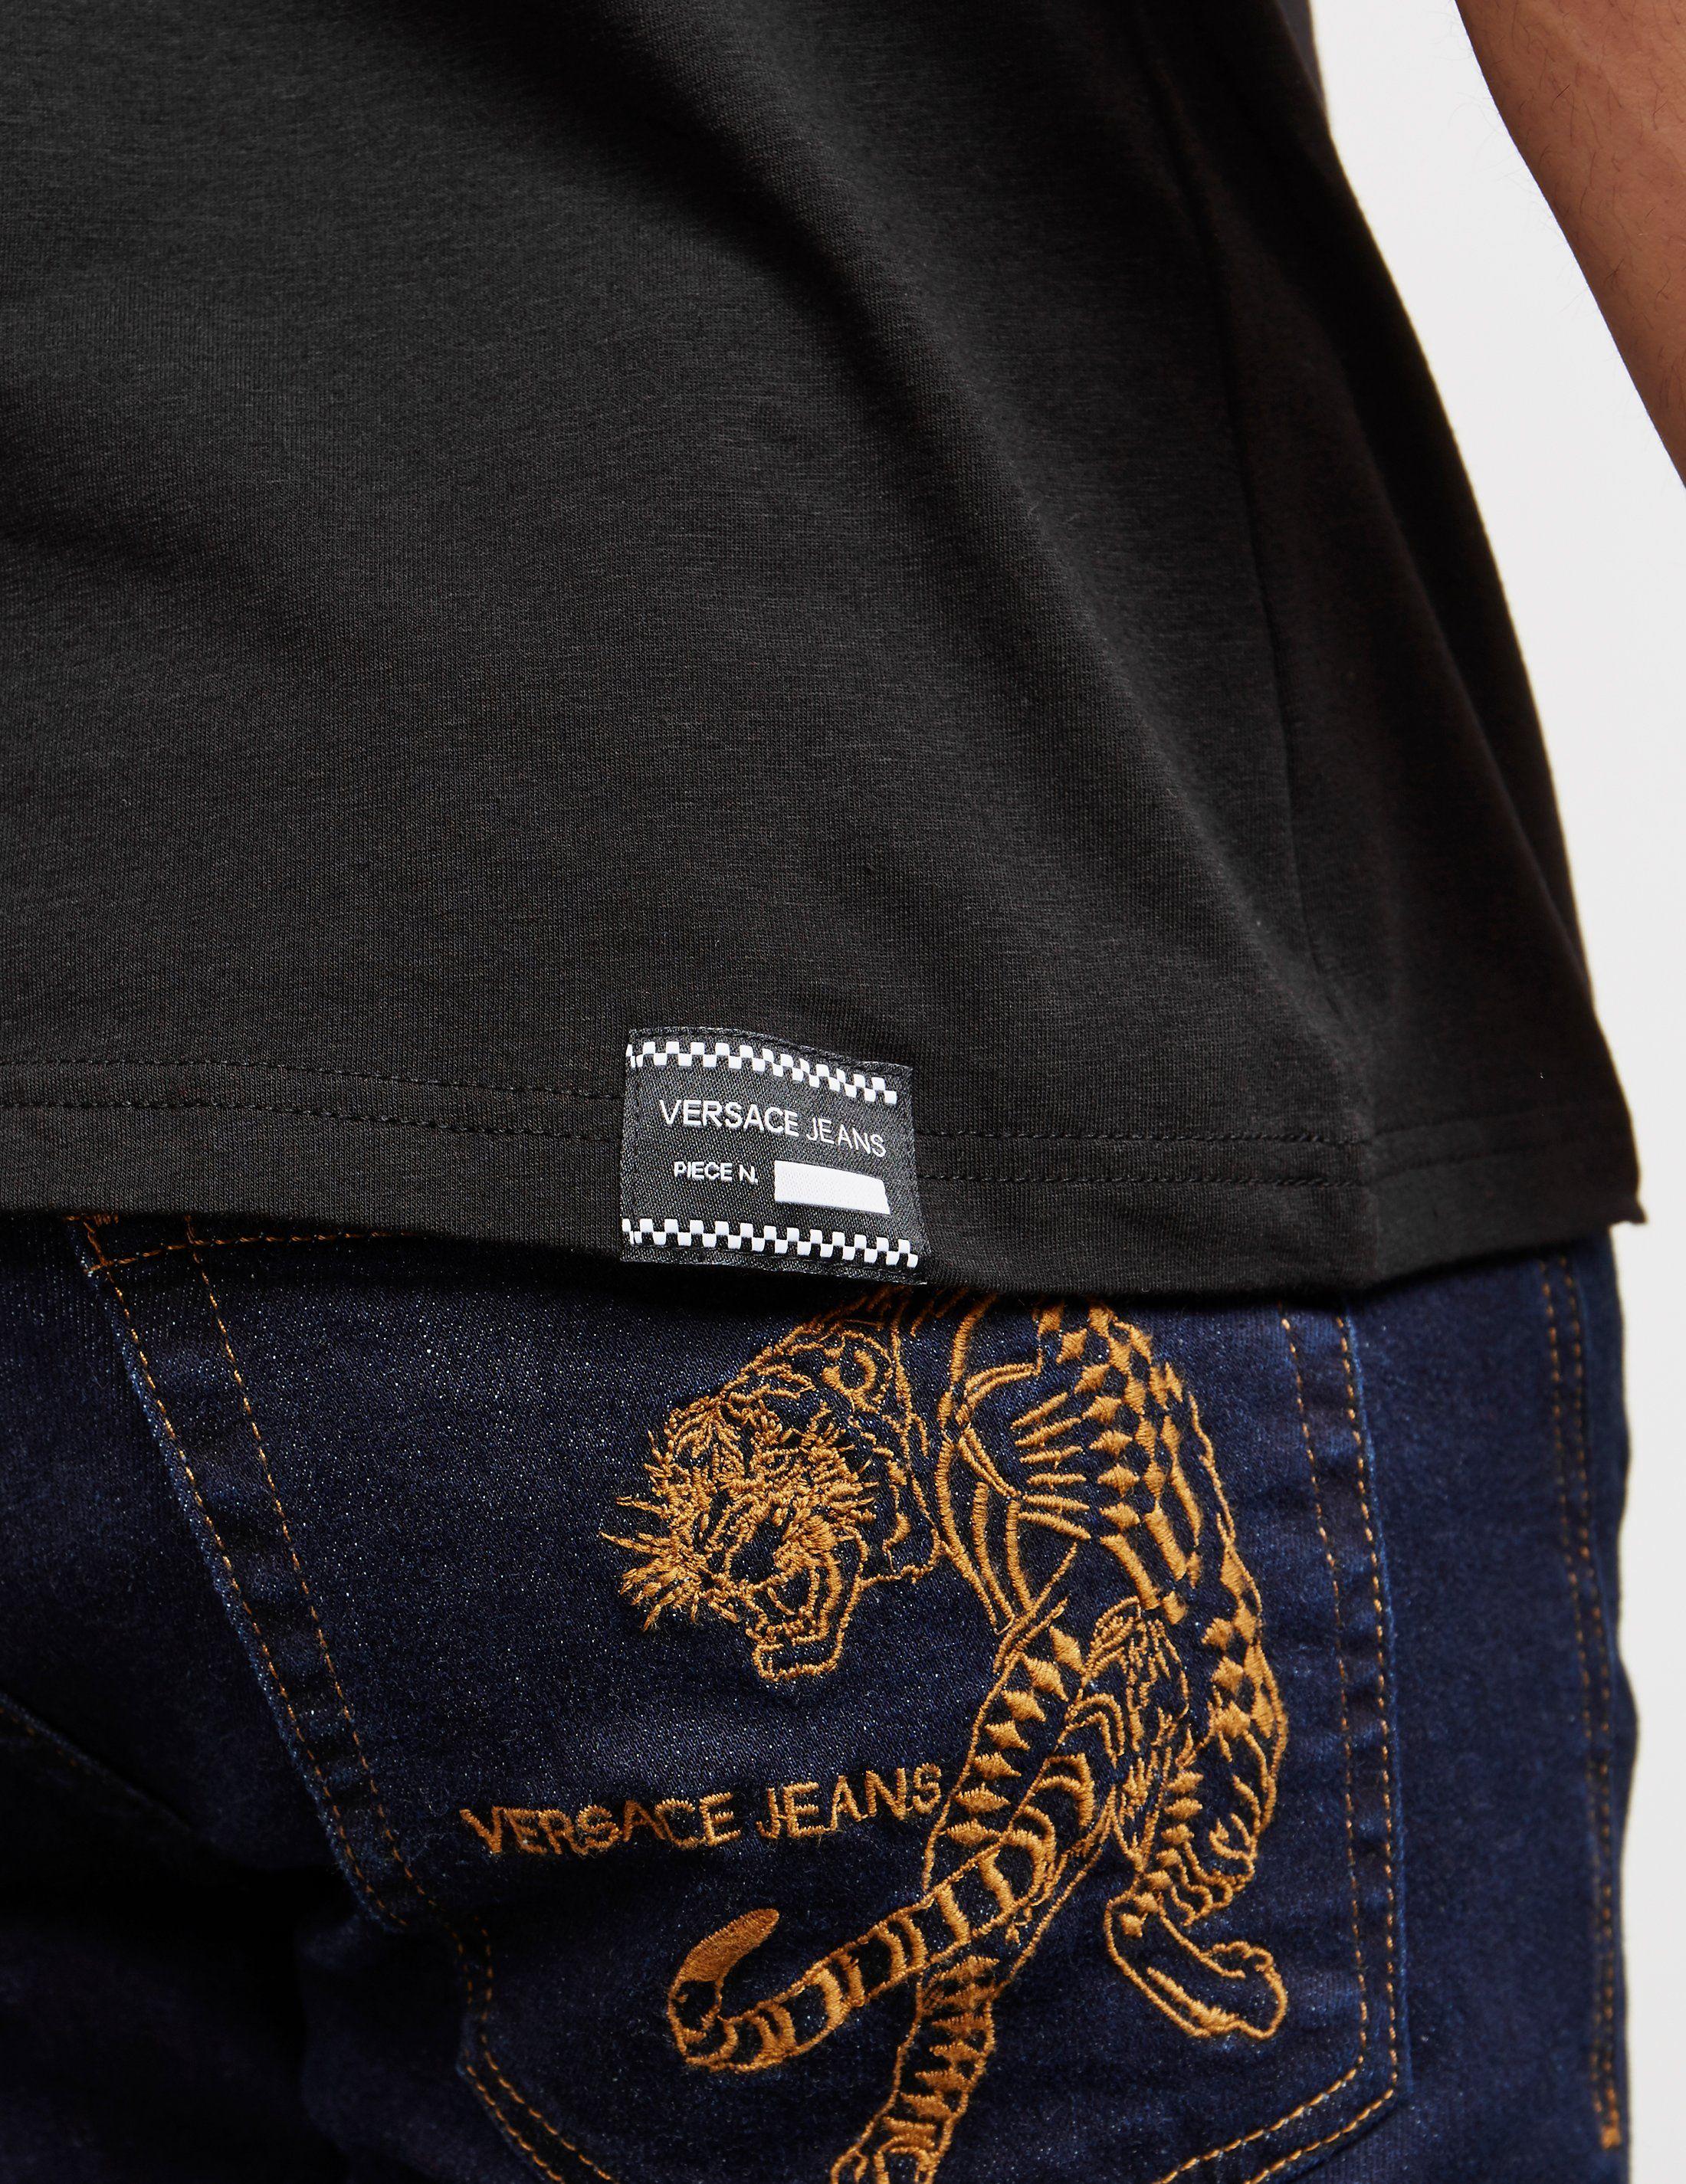 Versace Jeans Circle Logo Short Sleeve T-Shirt